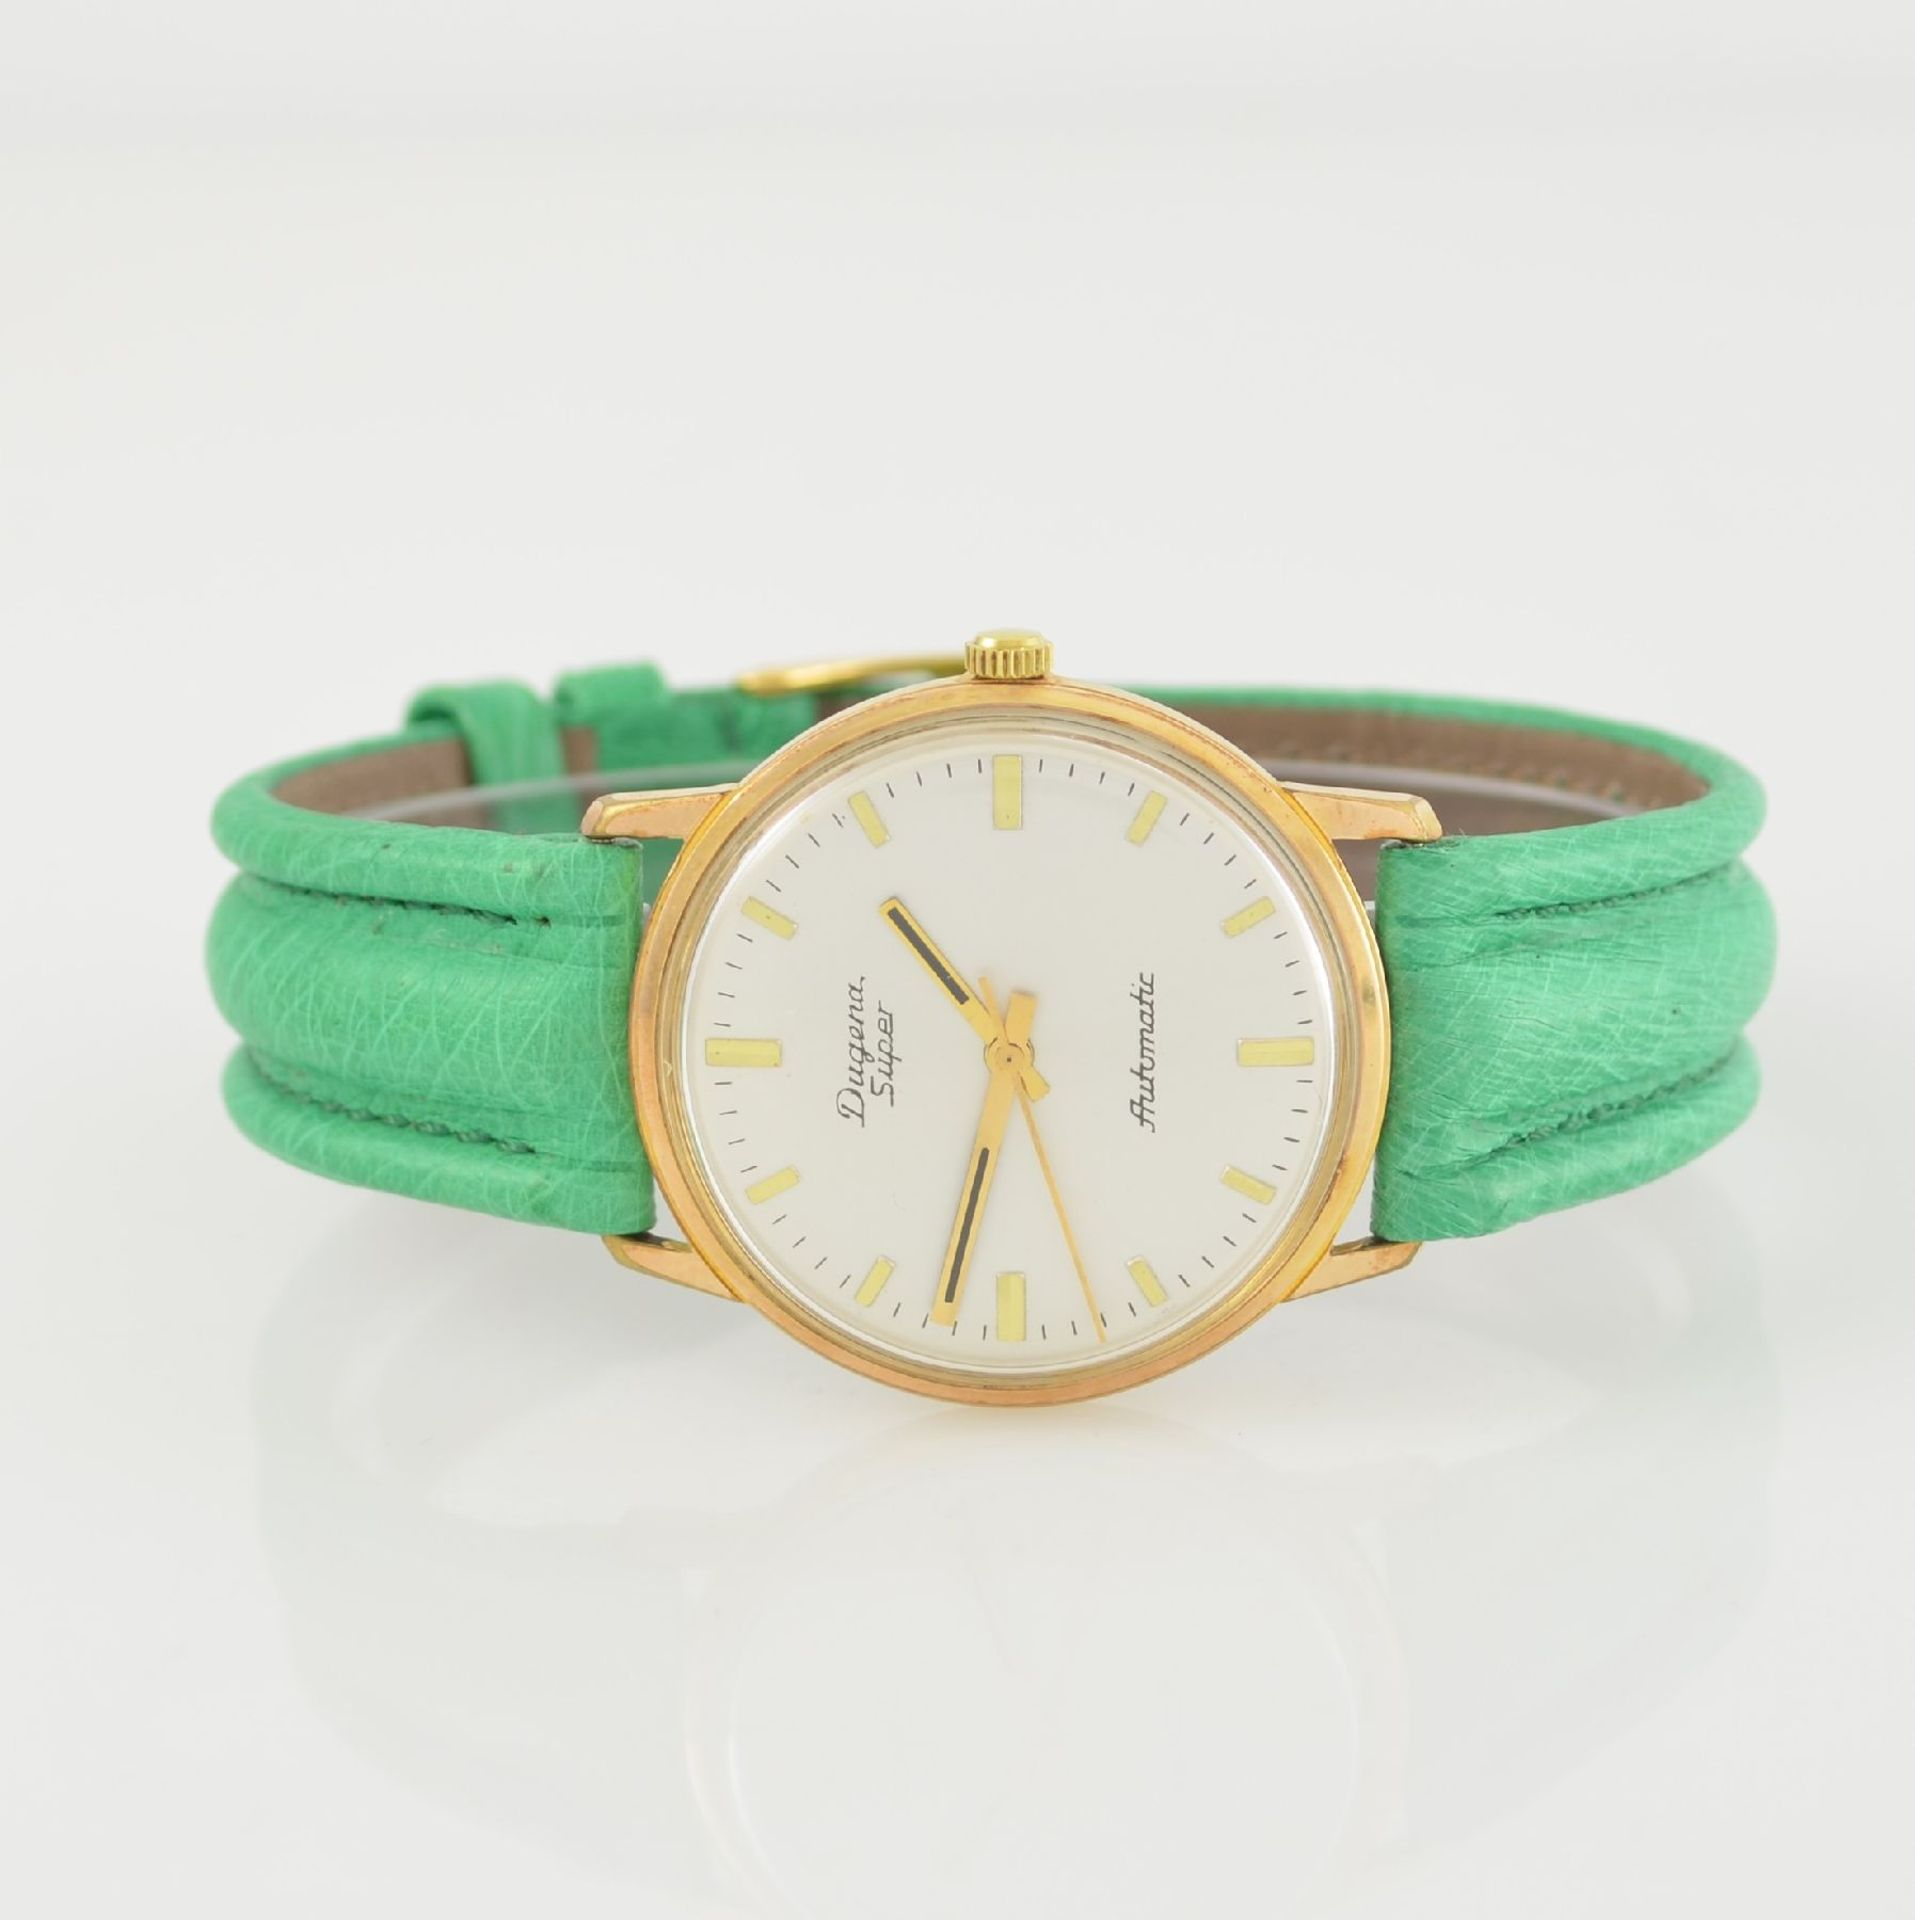 Konvolut: 2 Armbanduhren, beide Schweiz um 1970, beide Metall verg., 1 x Arsa Armbandwecker, Boden - Bild 7 aus 12